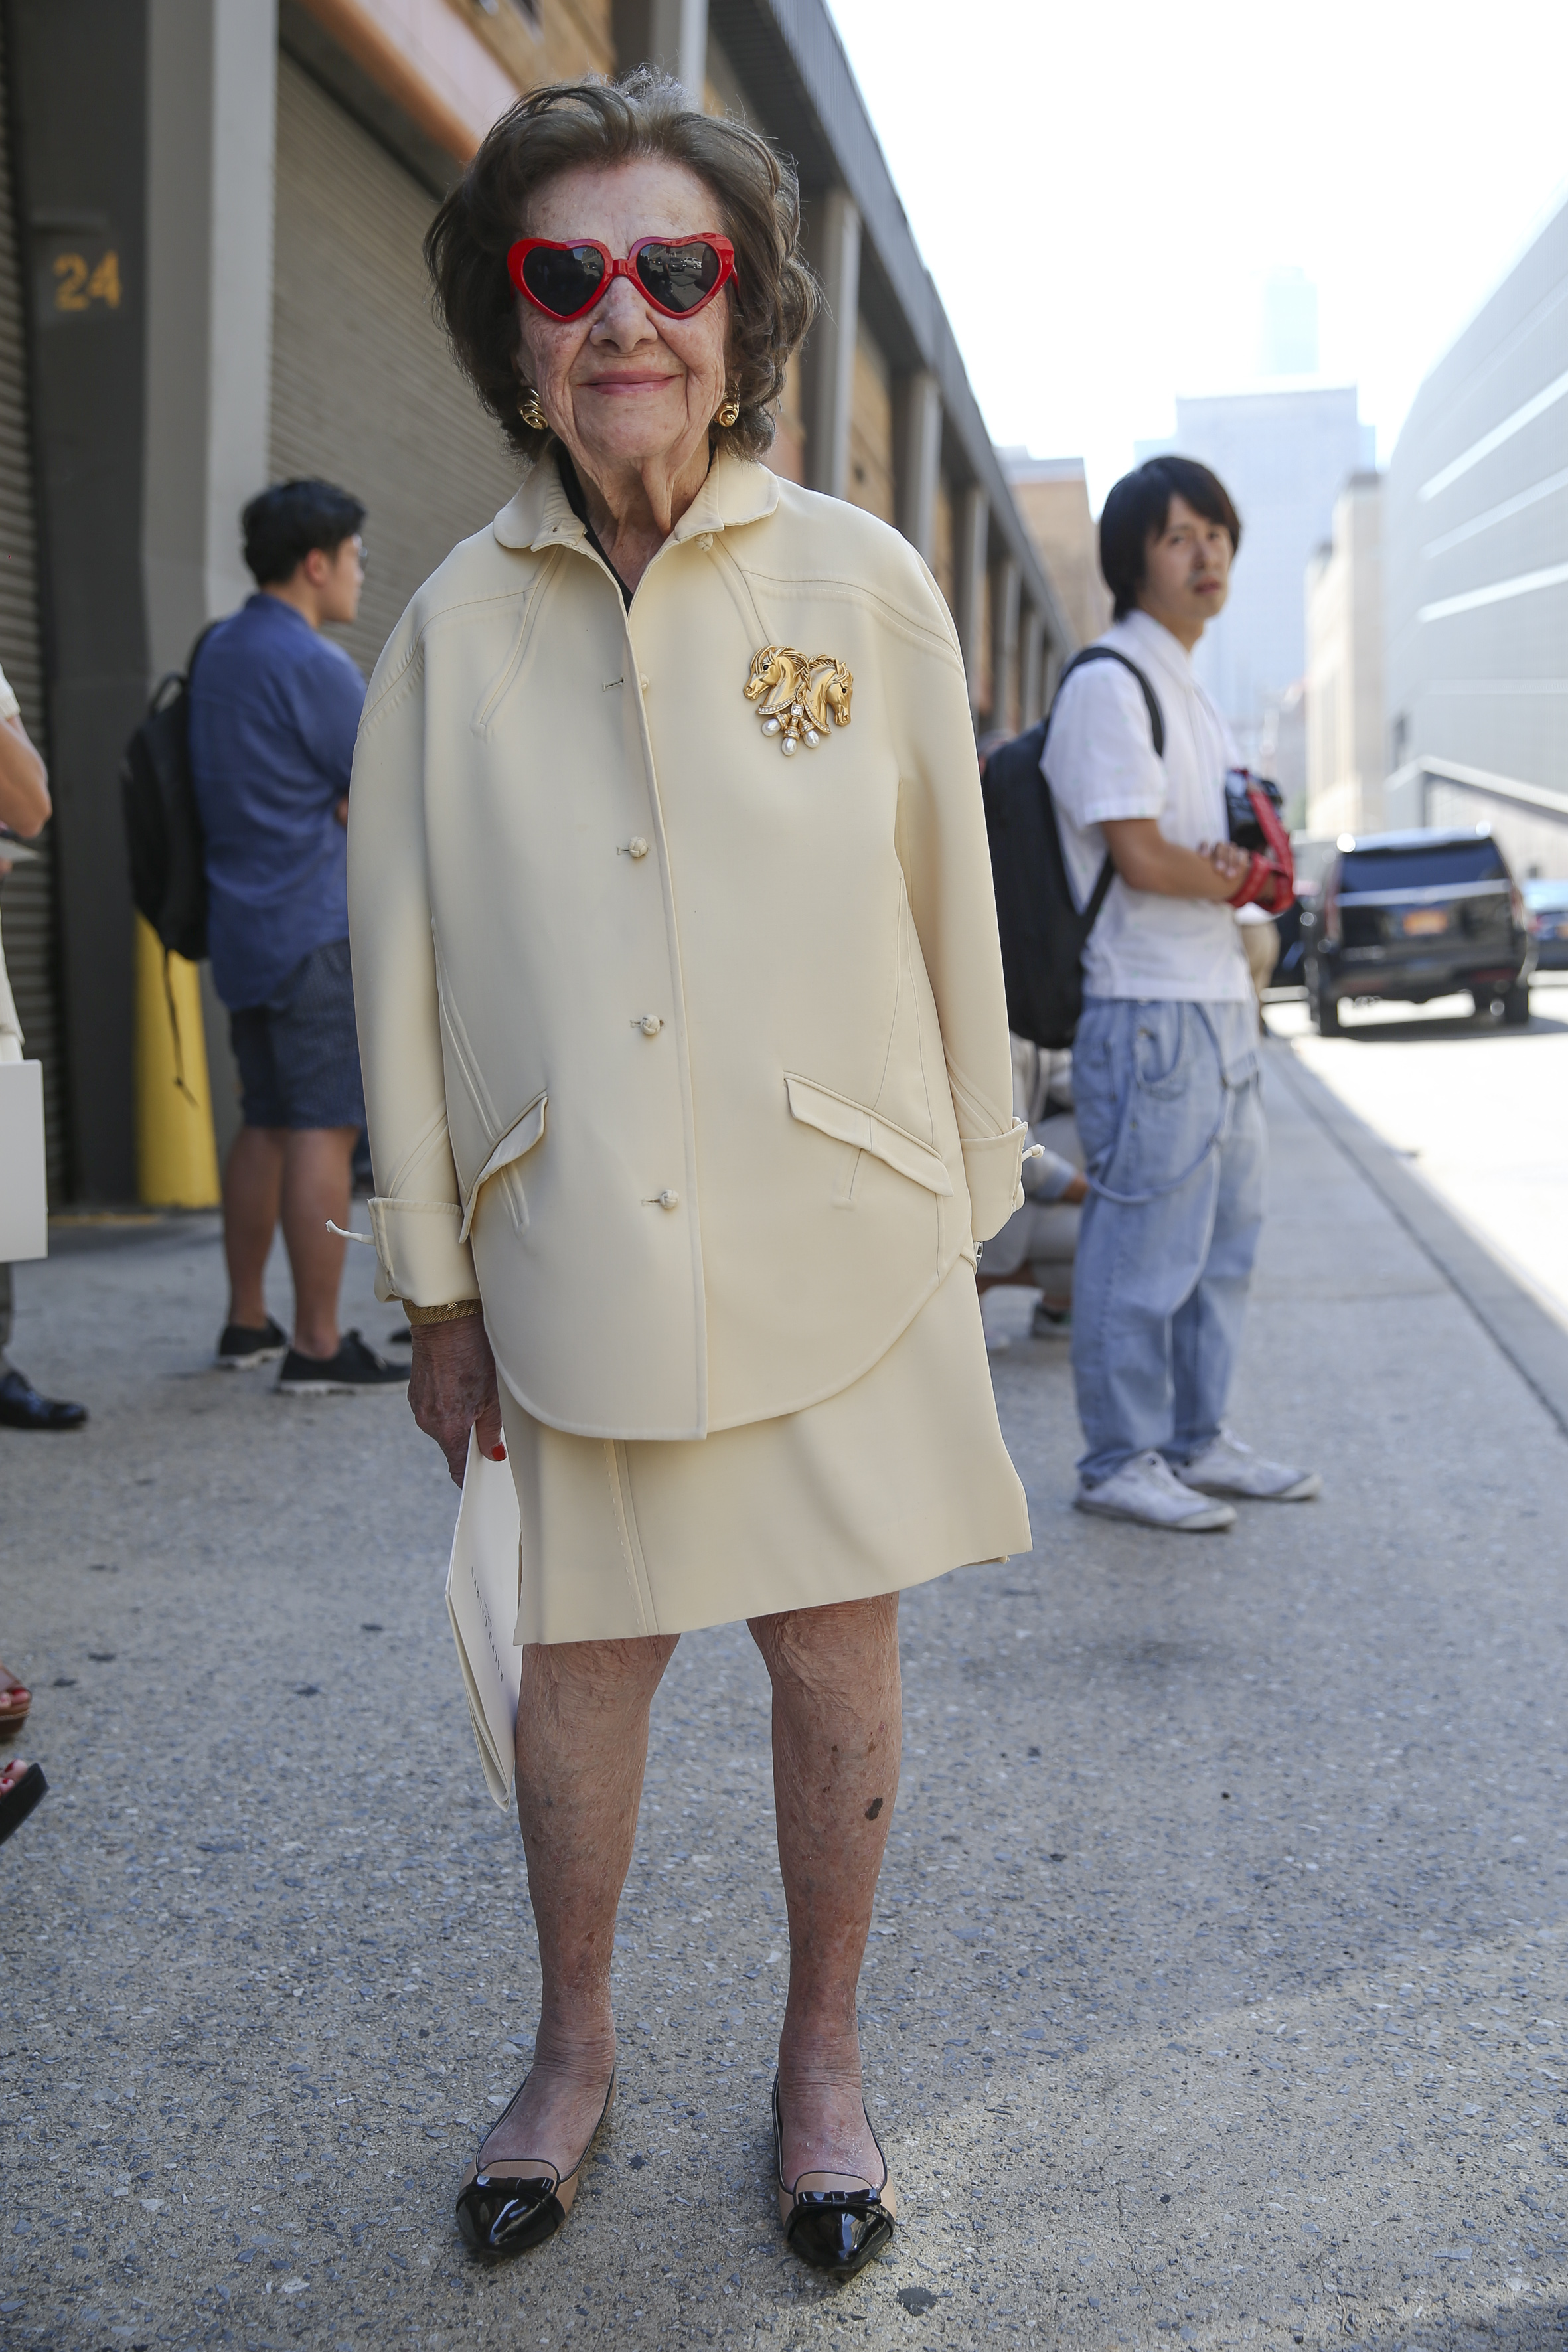 streetstyle lady new york granny classy